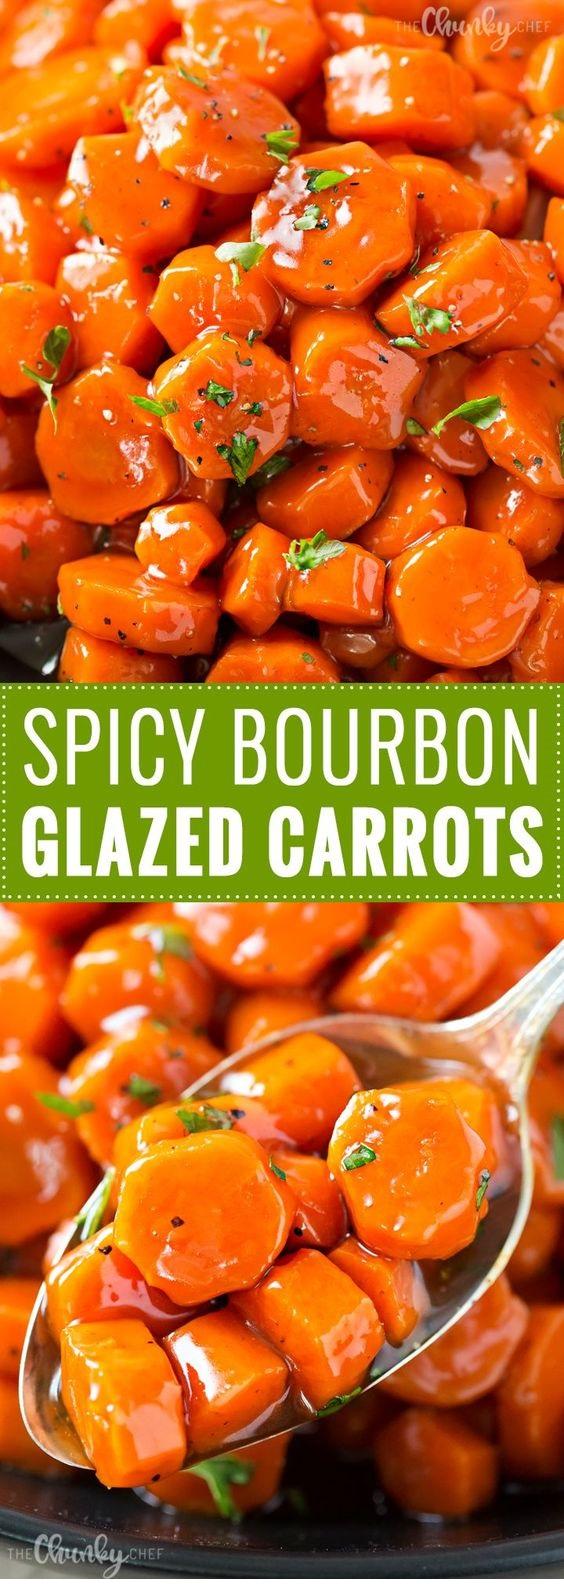 Spicy Bourbon Glazed Carrots